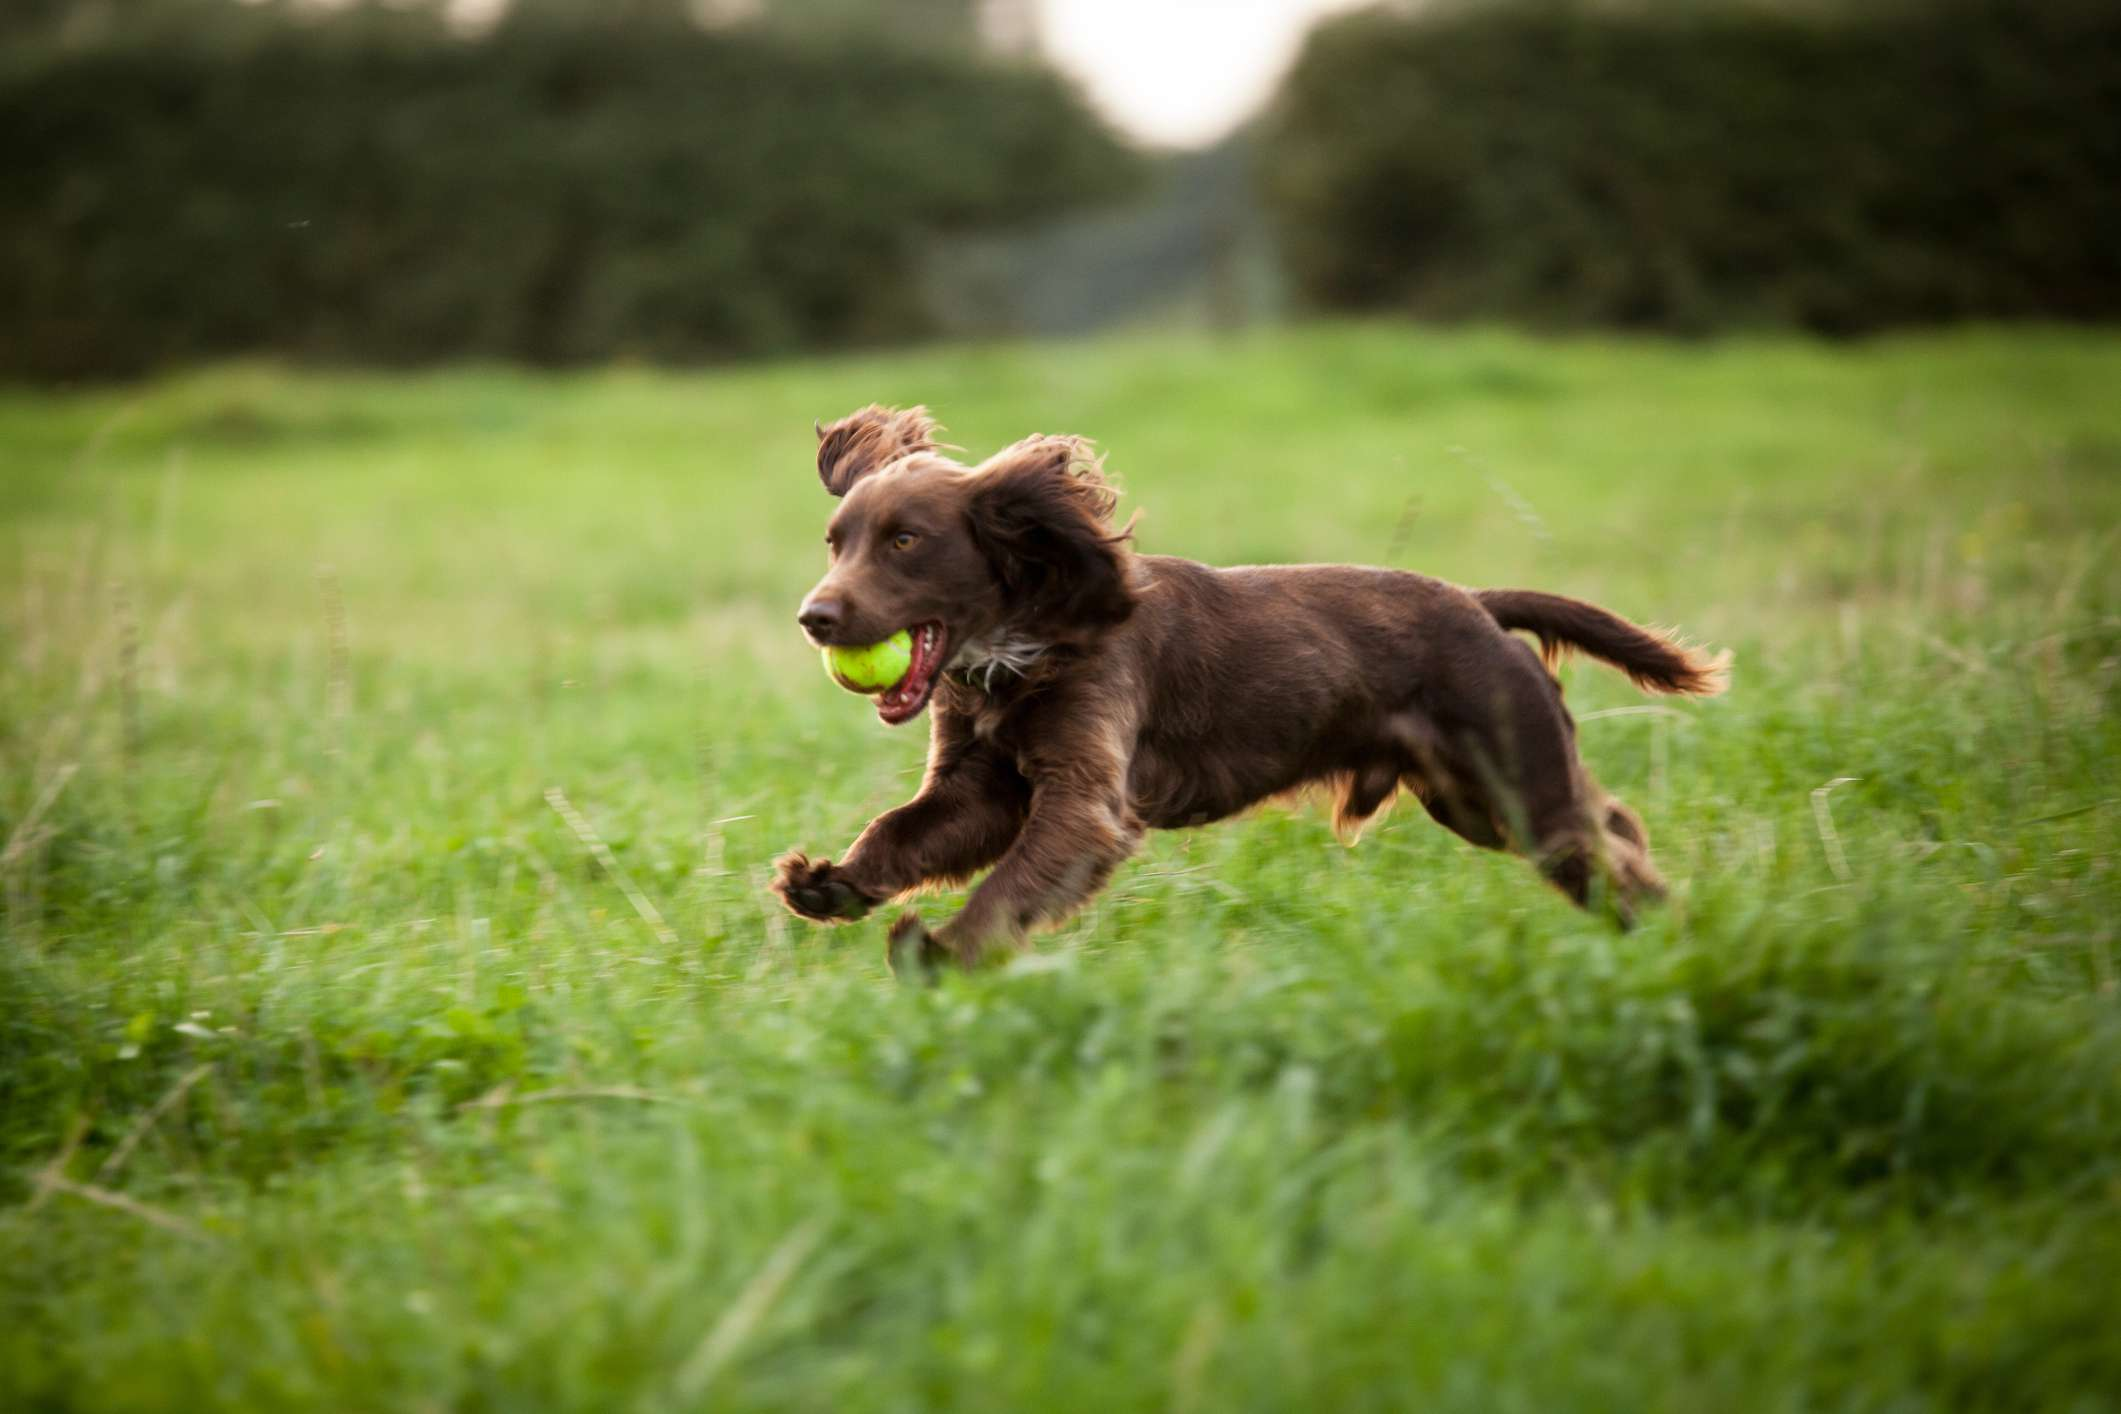 Boykin Spaniel puppy running through field with tennis ball in mouth.